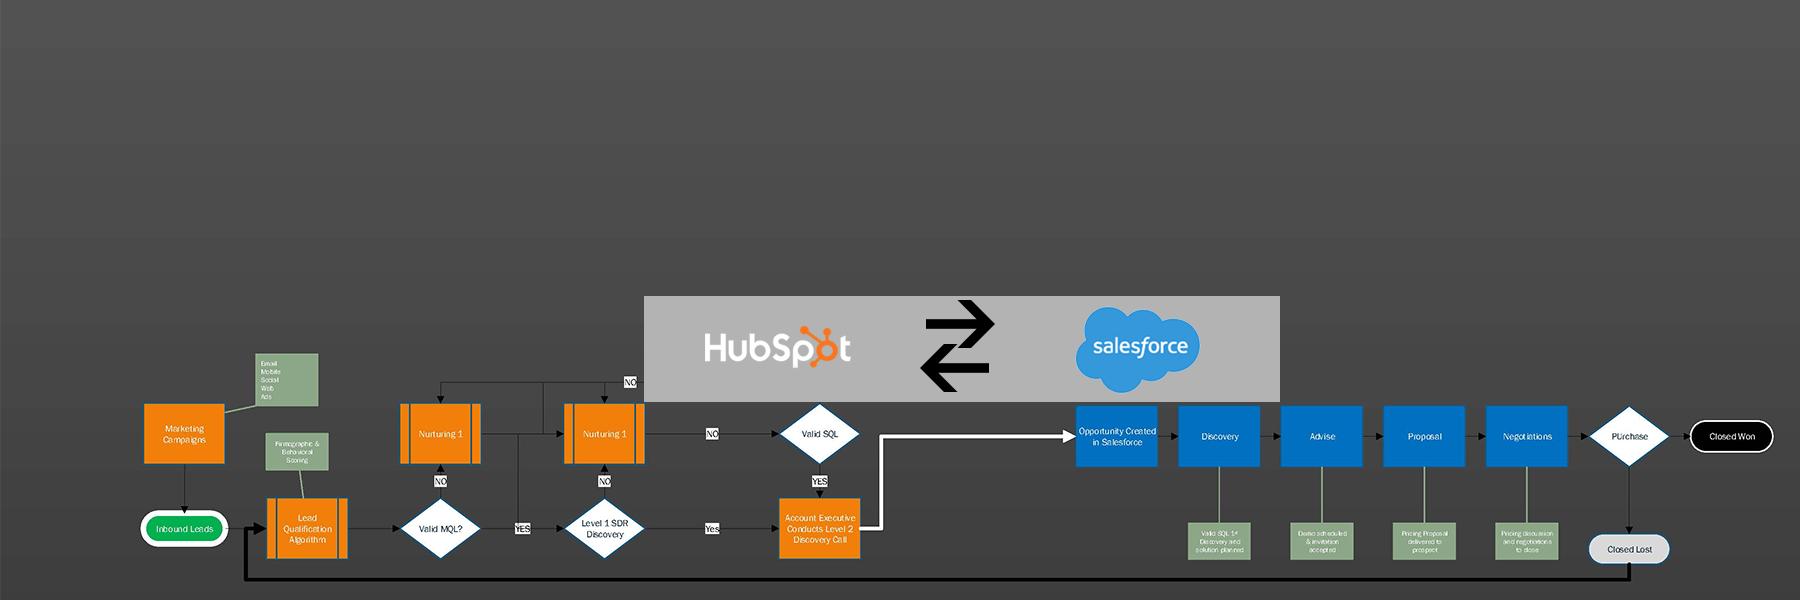 Directory-Page-Main-image-HubSpot-version